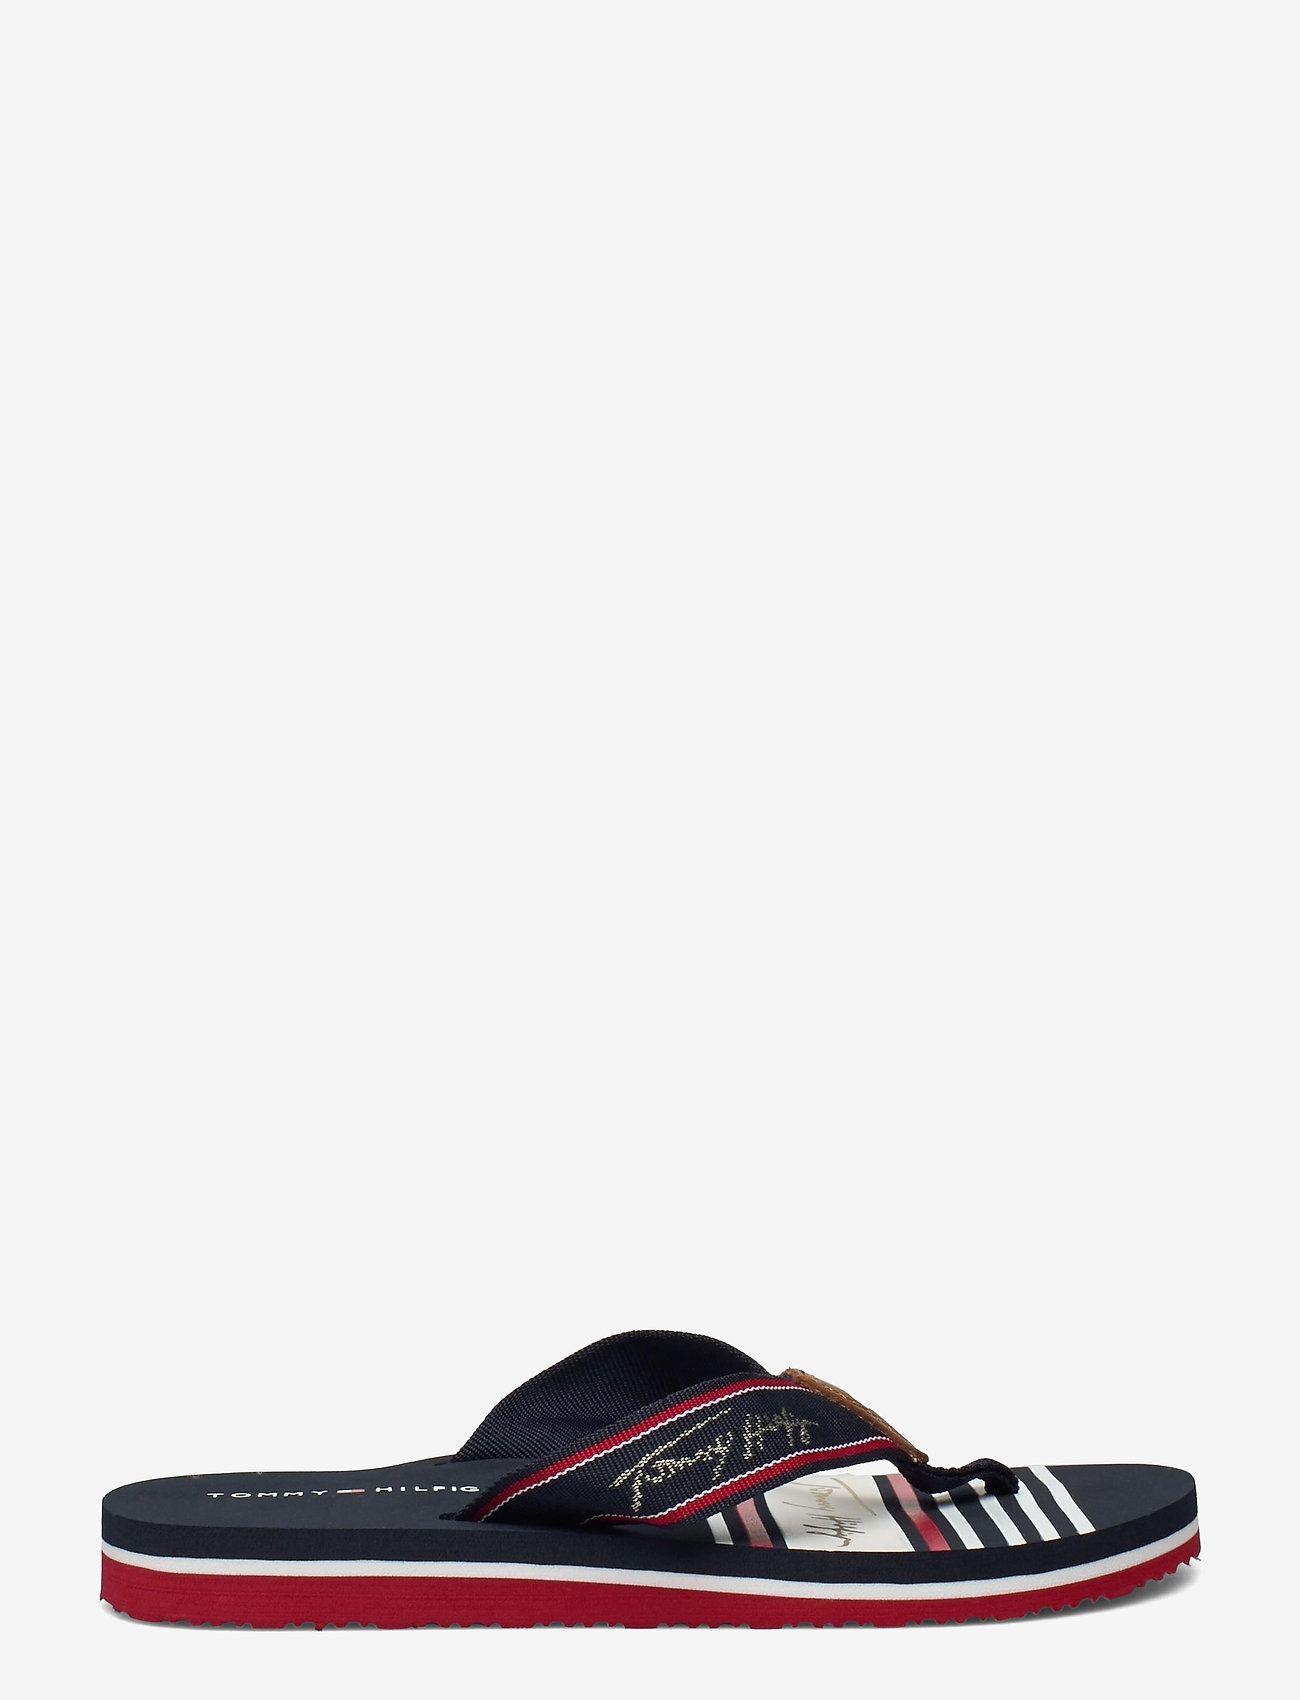 Tommy Hilfiger - TOMMY SIGNATURE BEACH SANDAL - flat sandals - rwb - 1